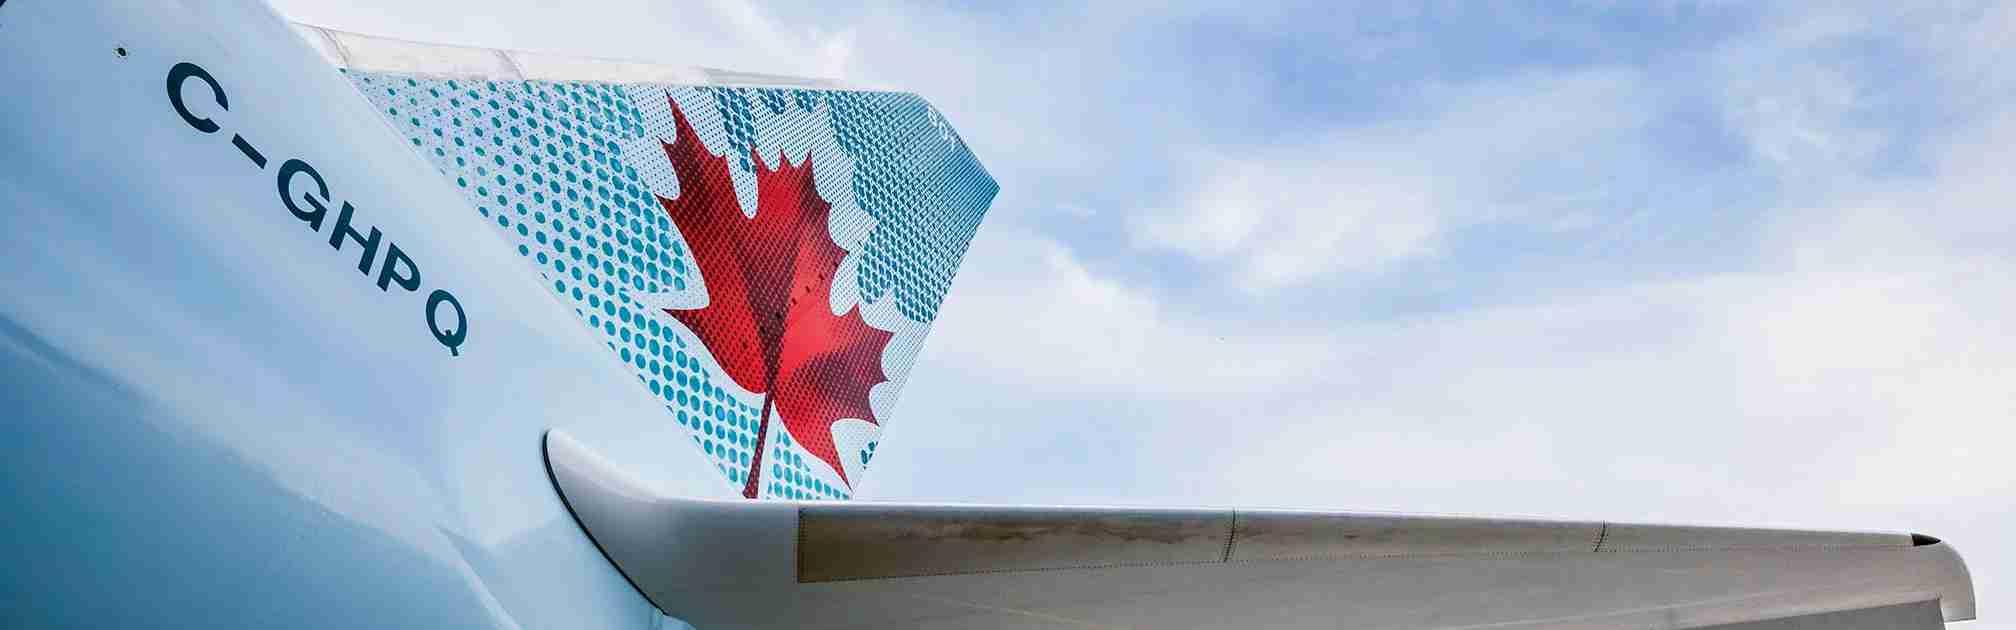 courtesy of Air Canada